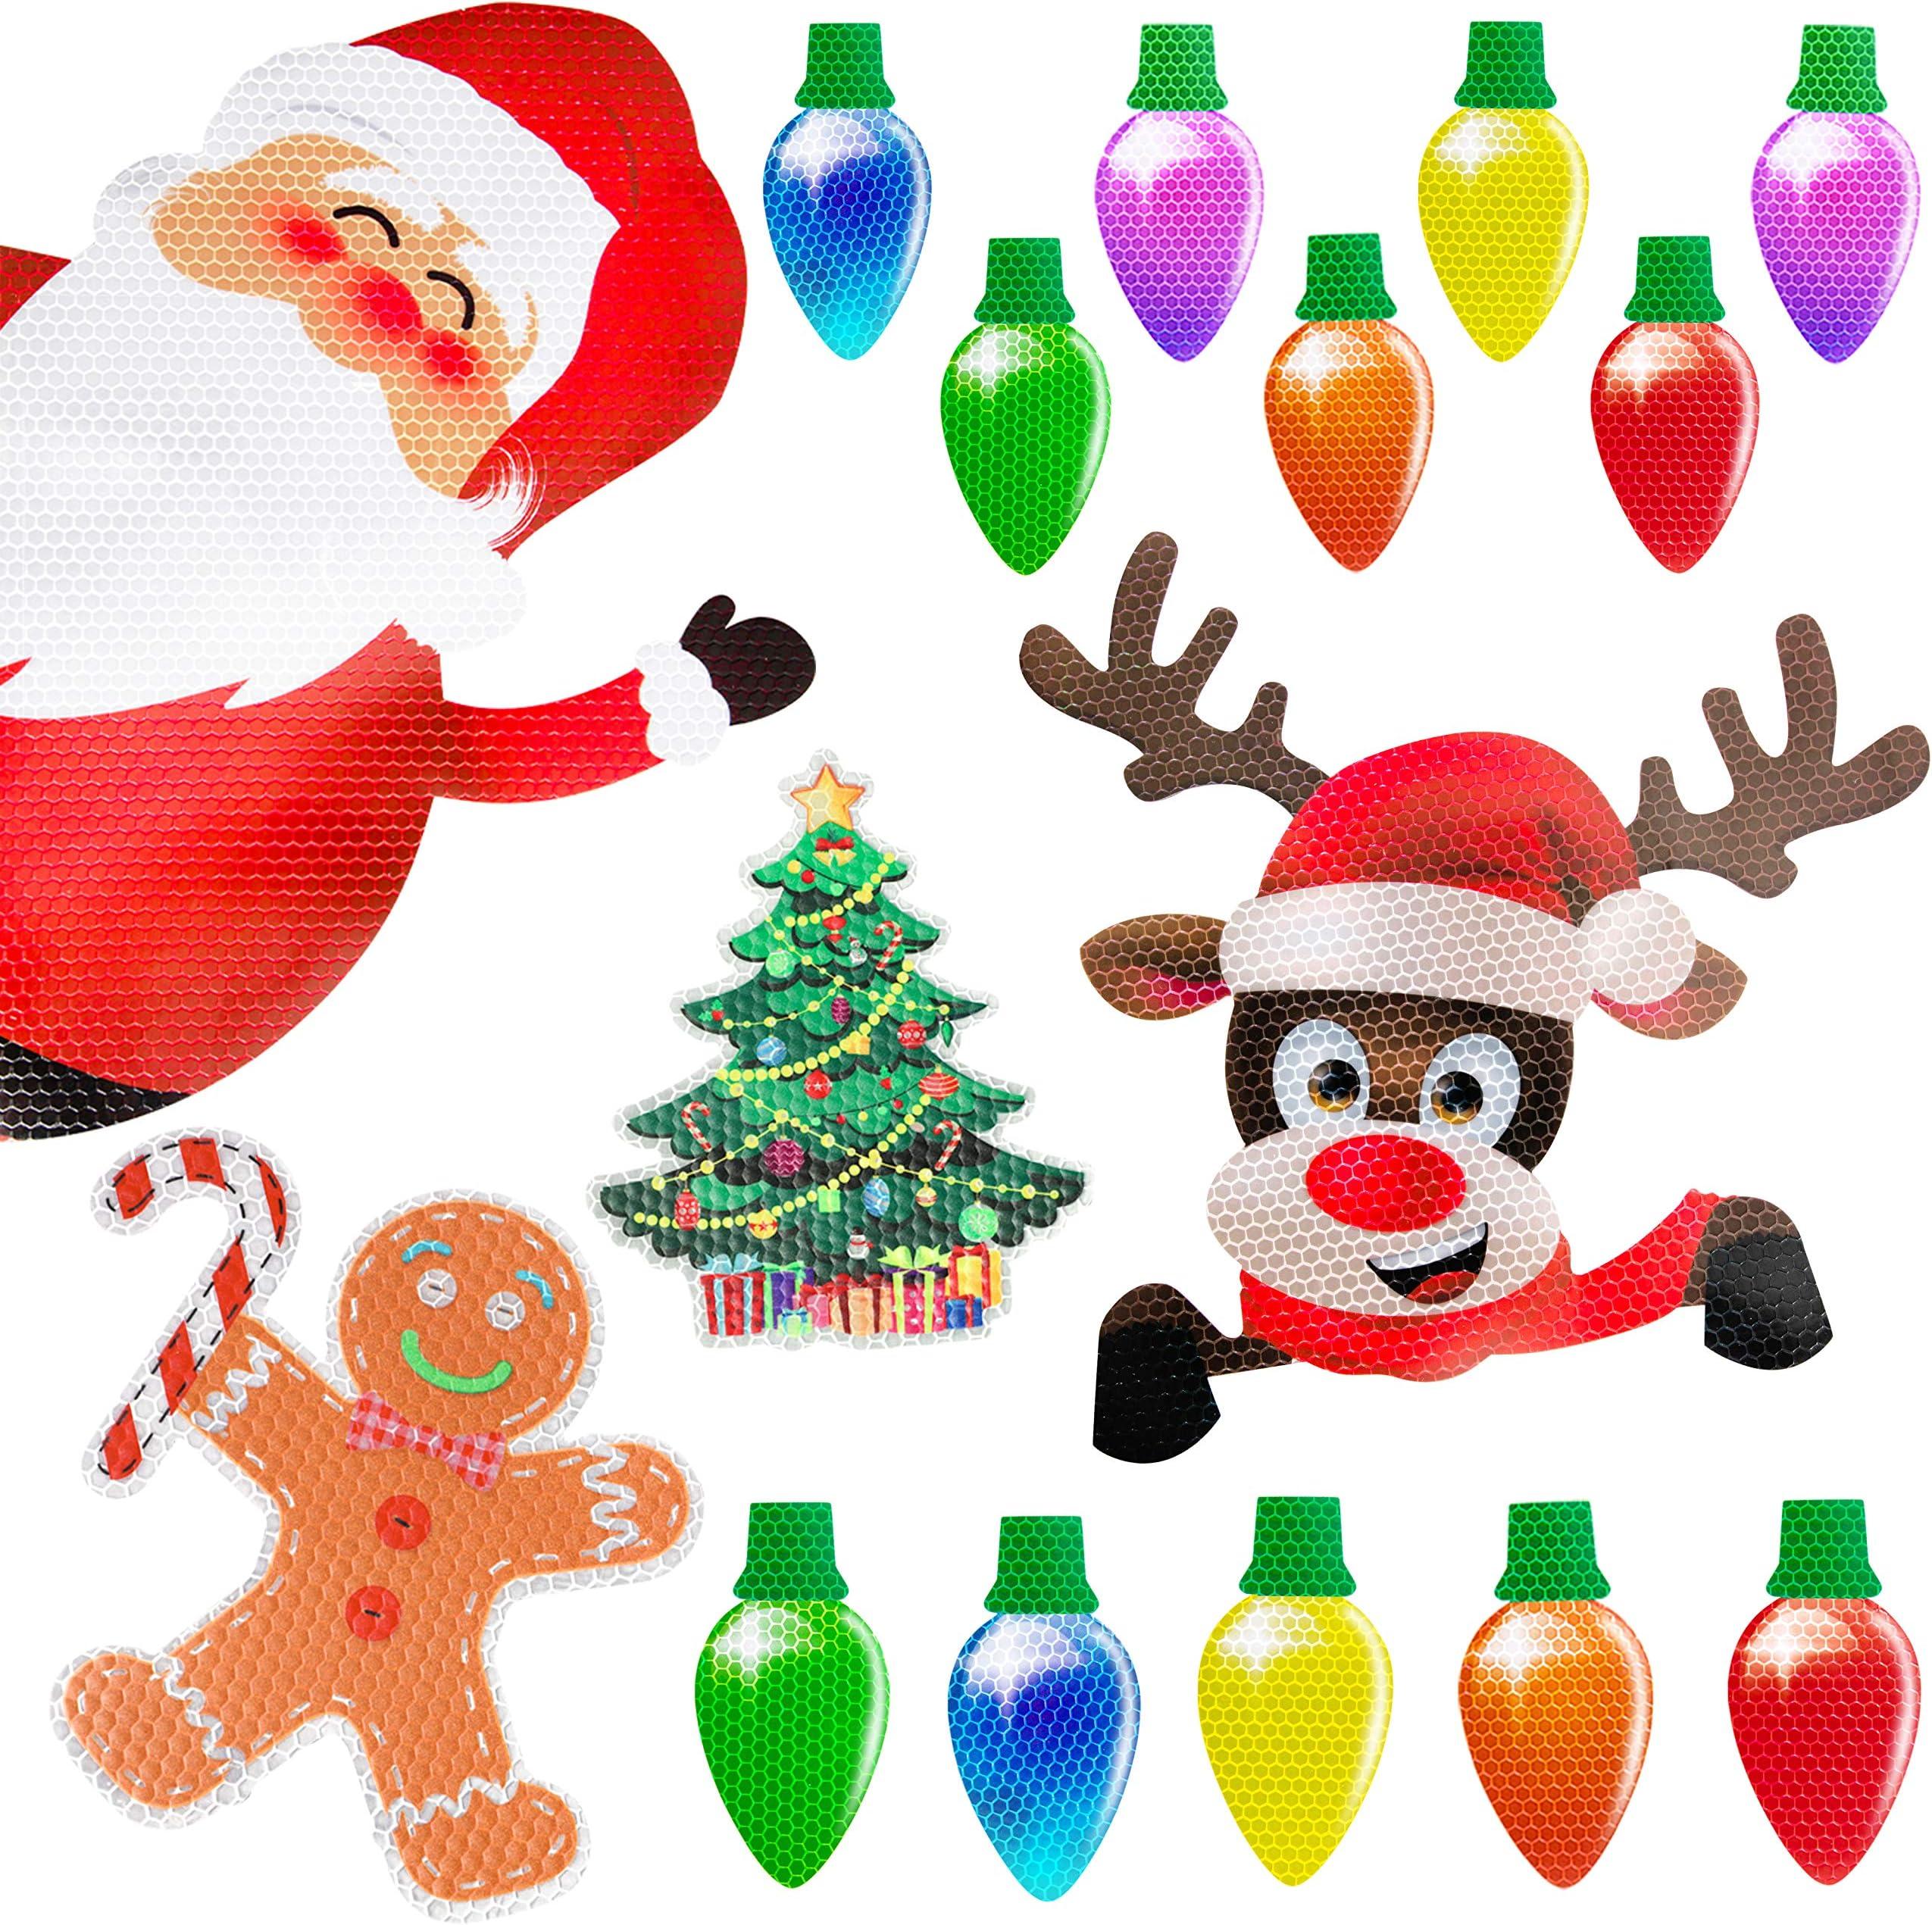 christmas magnet office magnet stocking filler wooden magnet Owl and Fox wooden fridge magnets Christmas decor kitchen decor